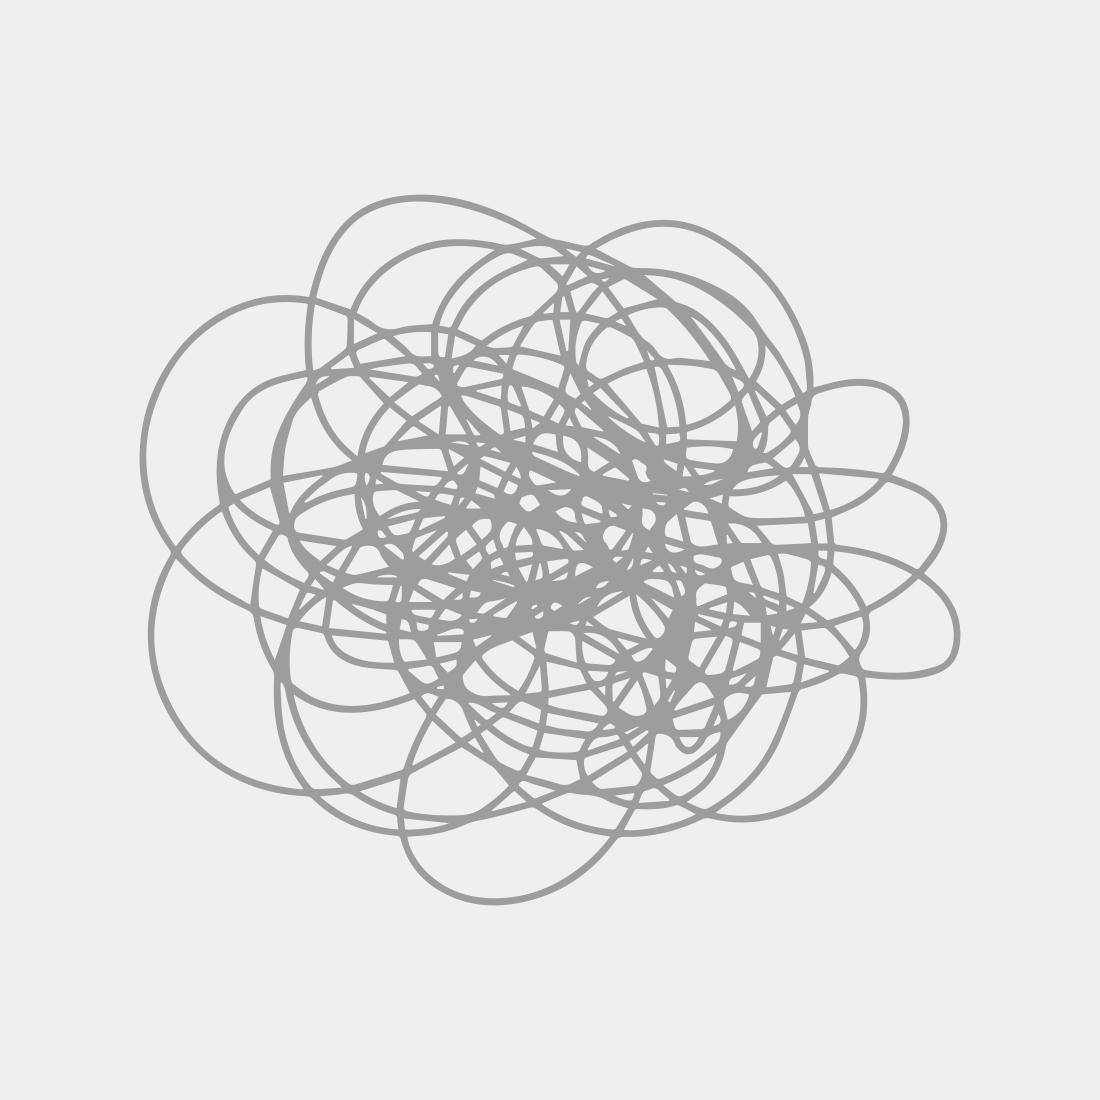 3D Printed Black Ring